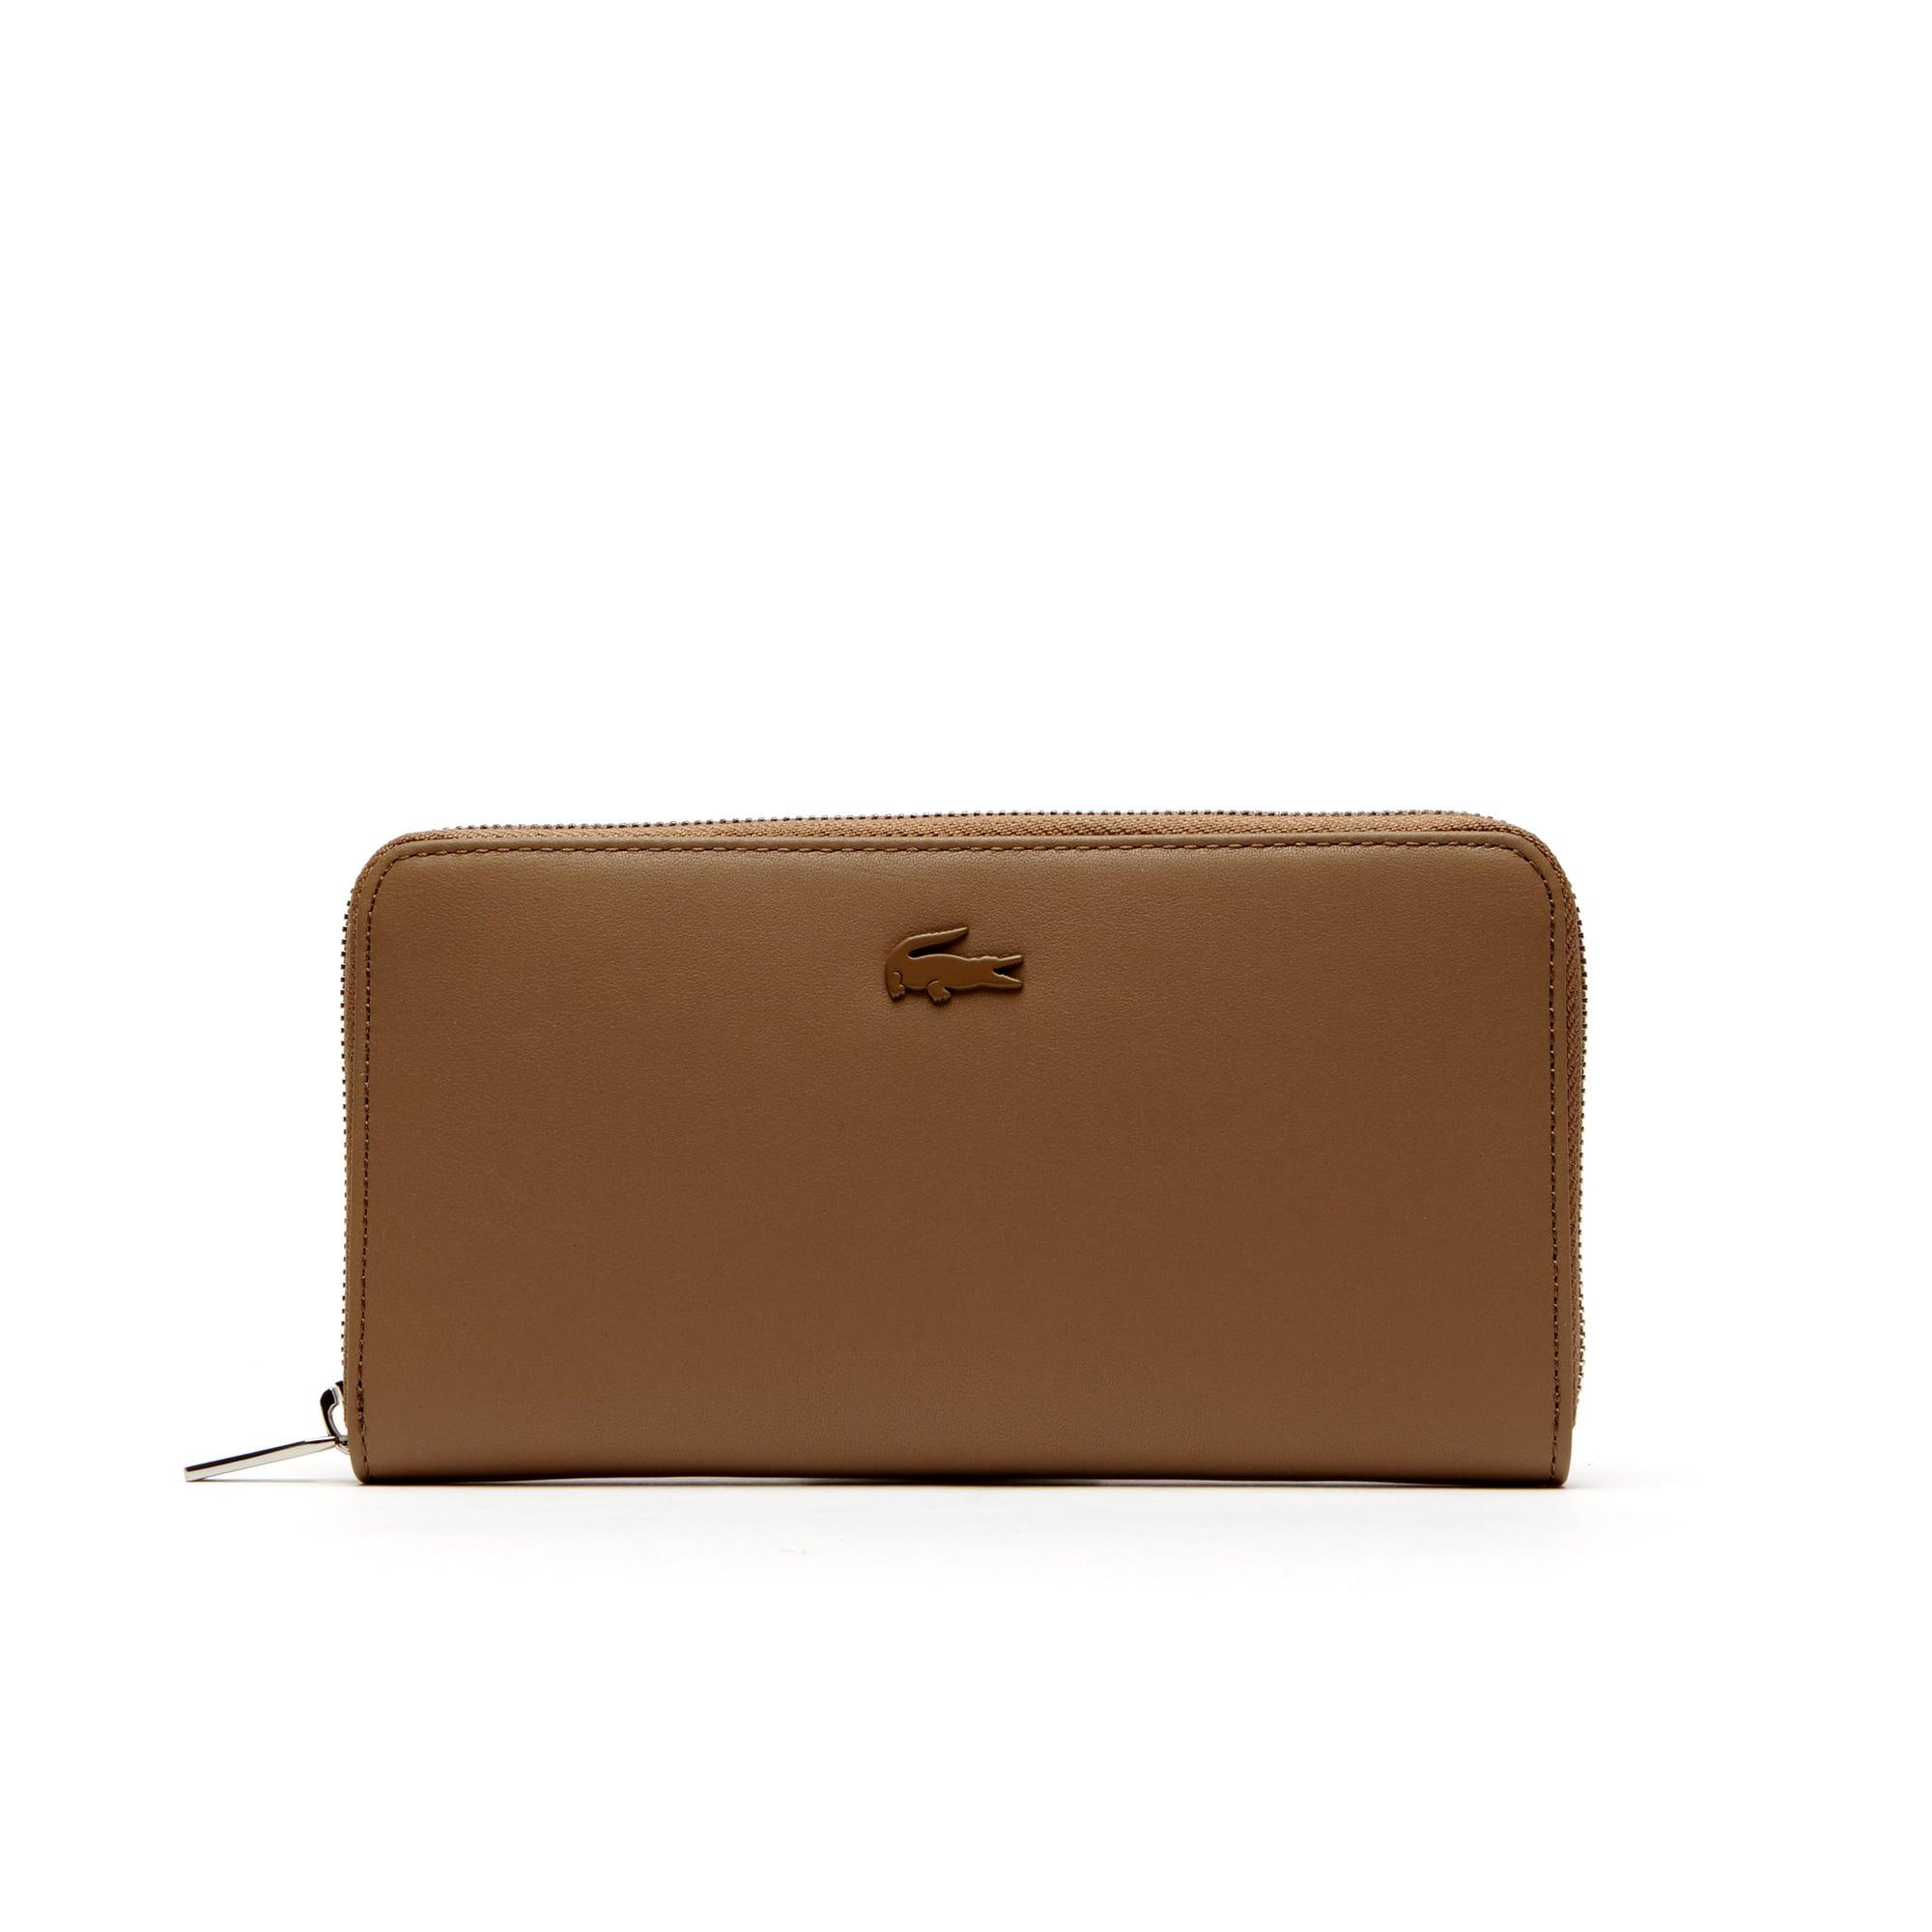 Women's Purity Soft Monochrome Leather 8 Card Zip Wallet